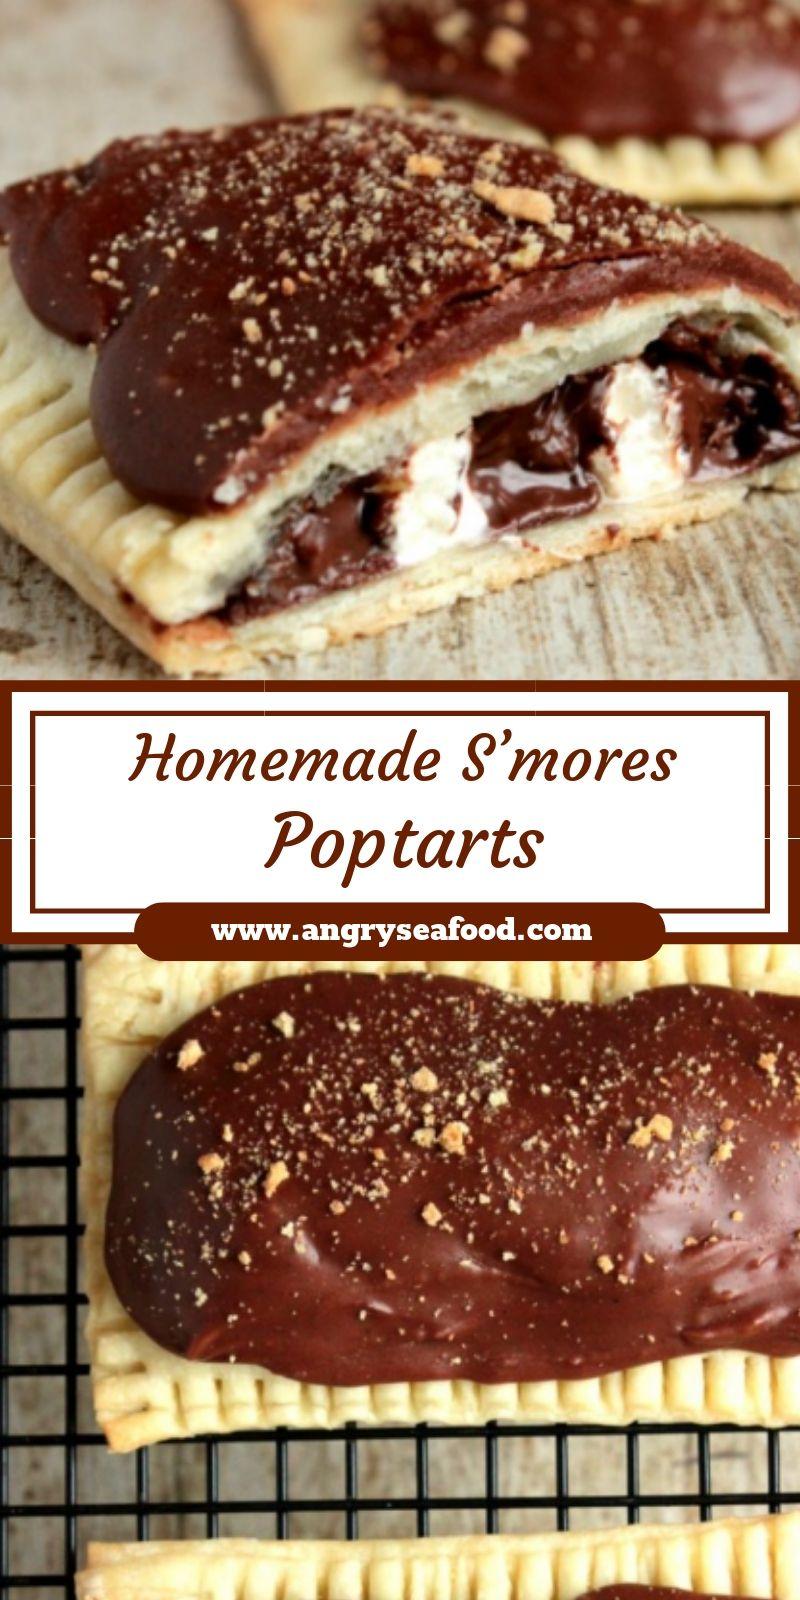 Homemade S'mores Poptarts